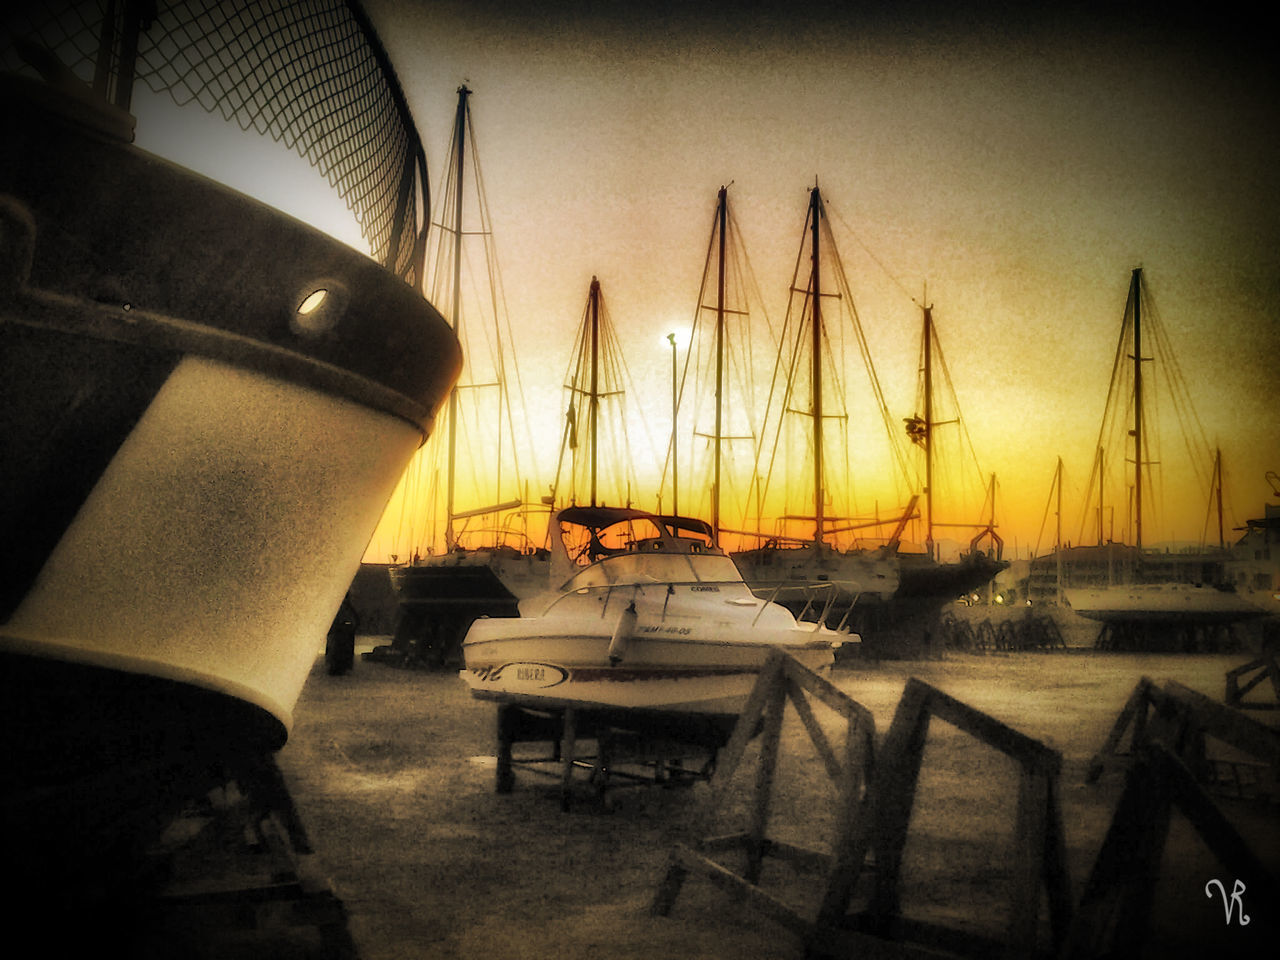 Almeriaturismo Almerimar Almería Barco Atardeceres Sunset_collection Cielo Barcos PuertoDeportivo Black And White And Color